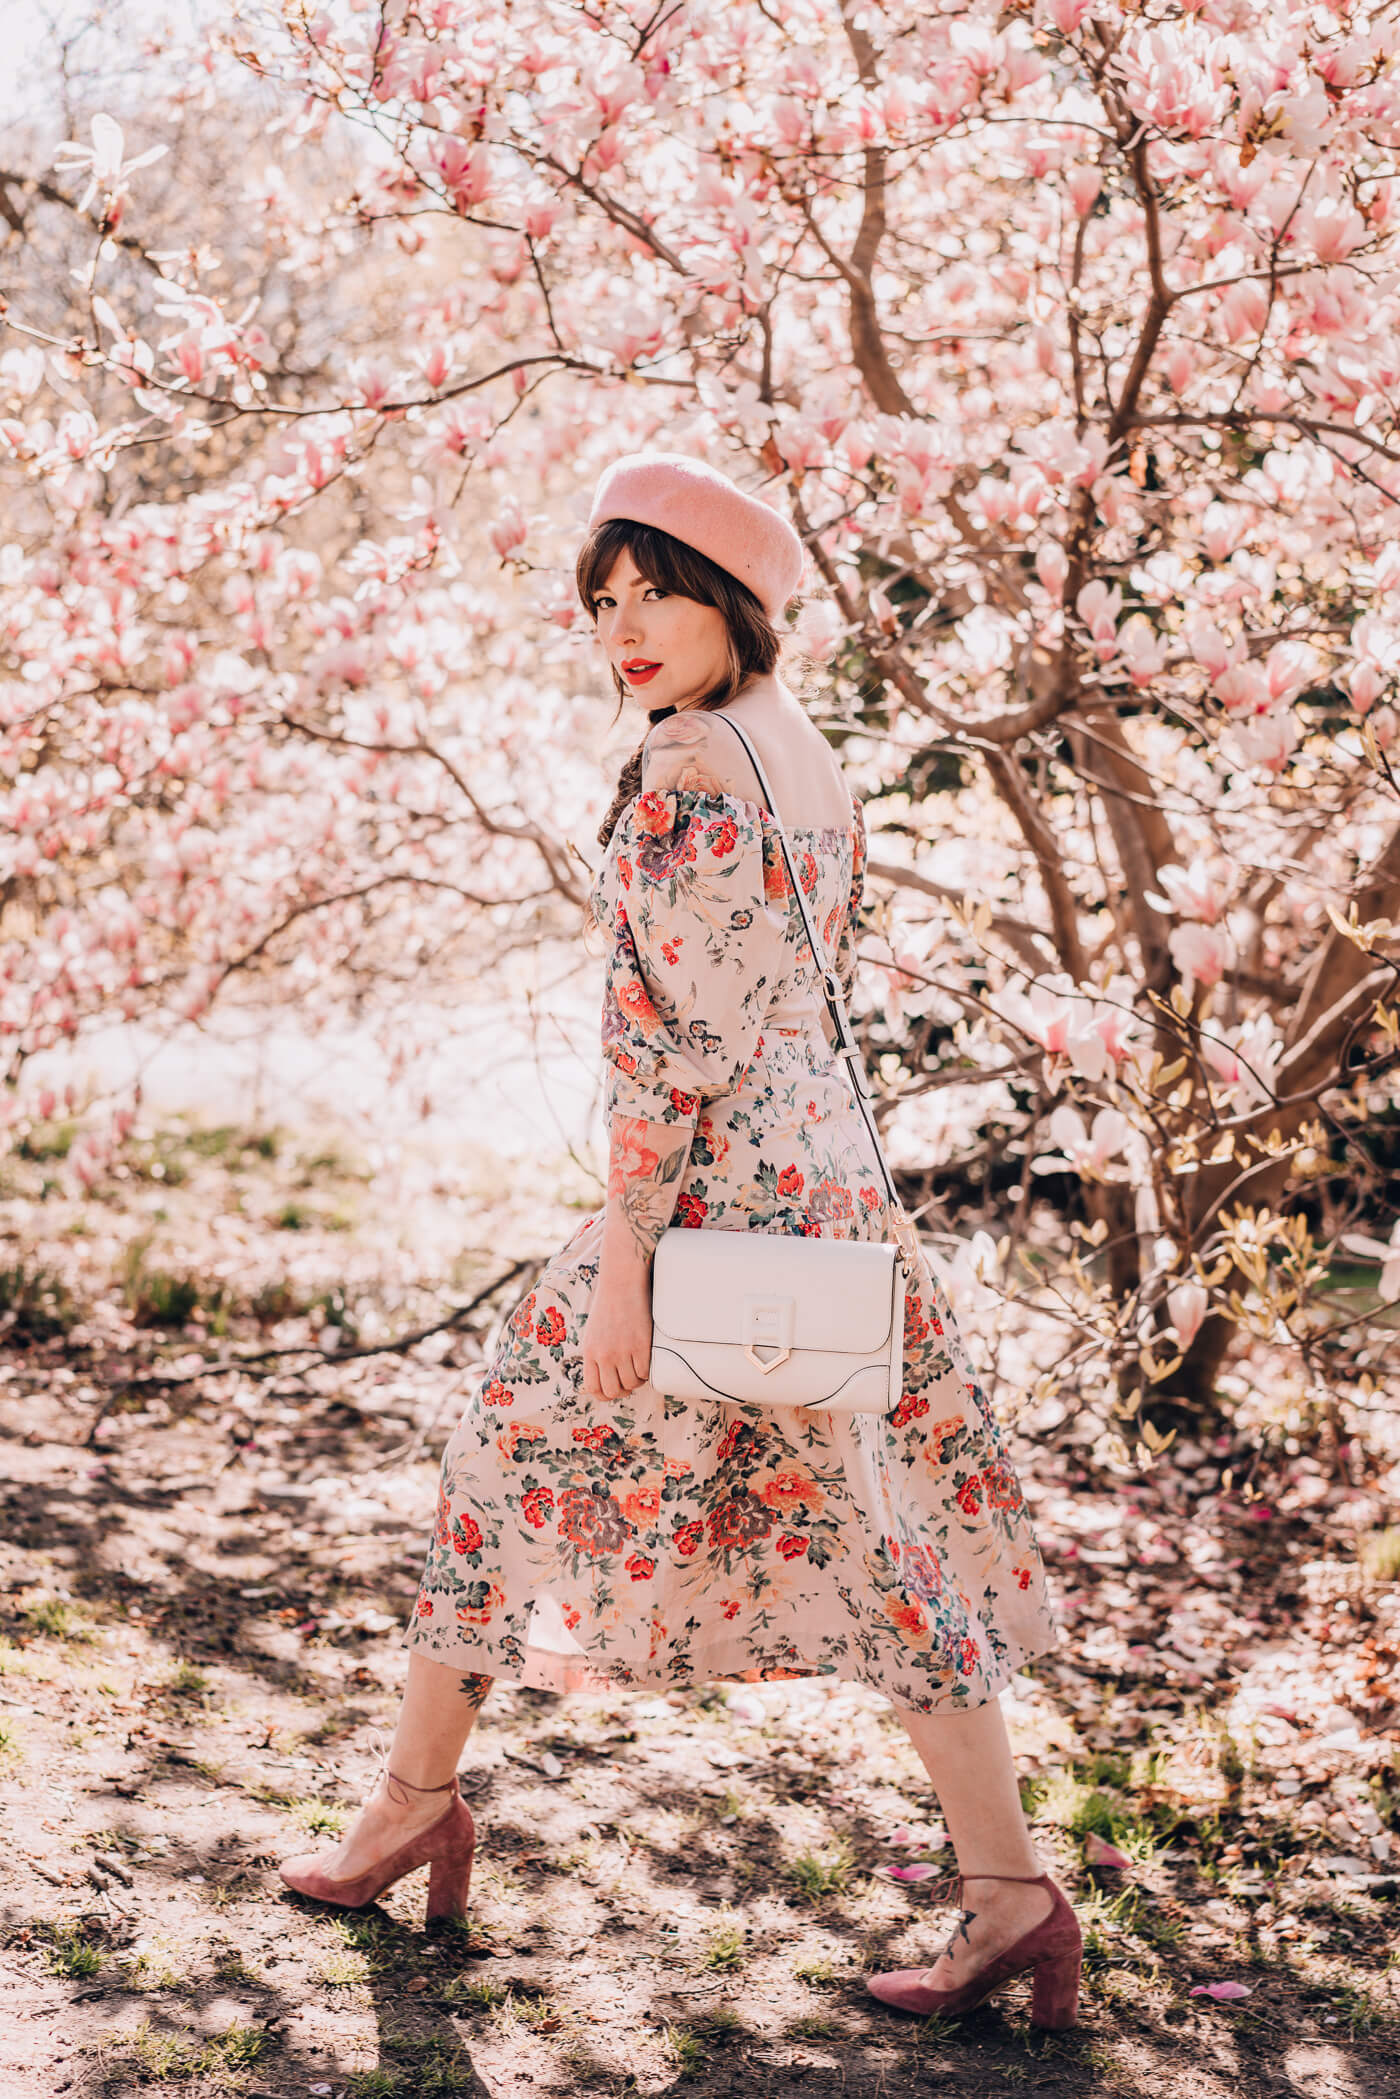 rebecca taylor dress, summer floral dress